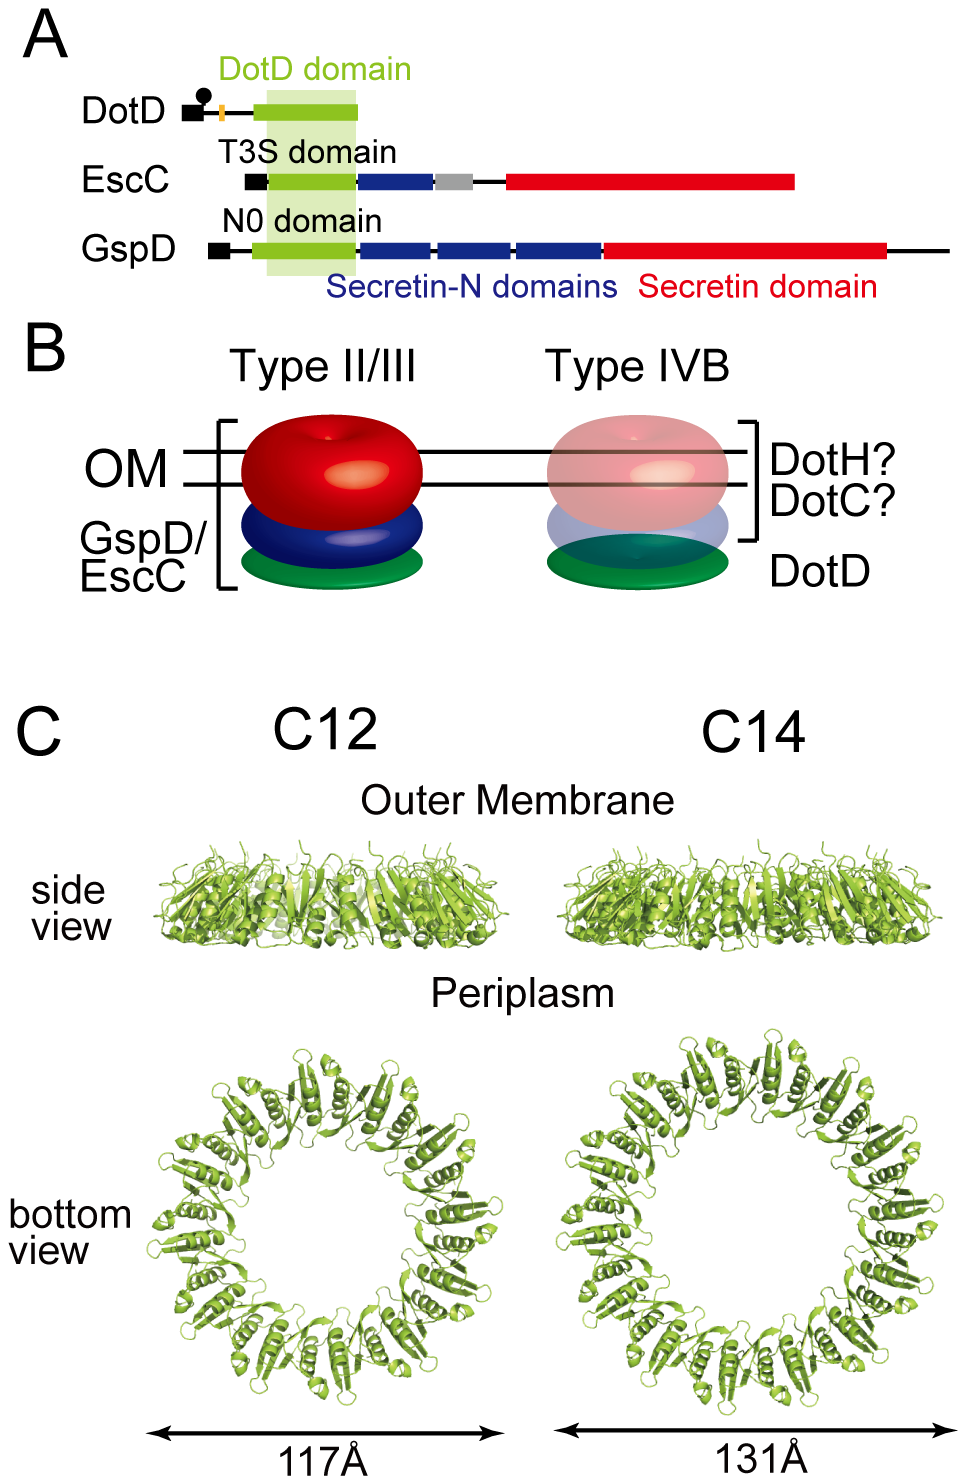 Periplasmic ring models of DotD.